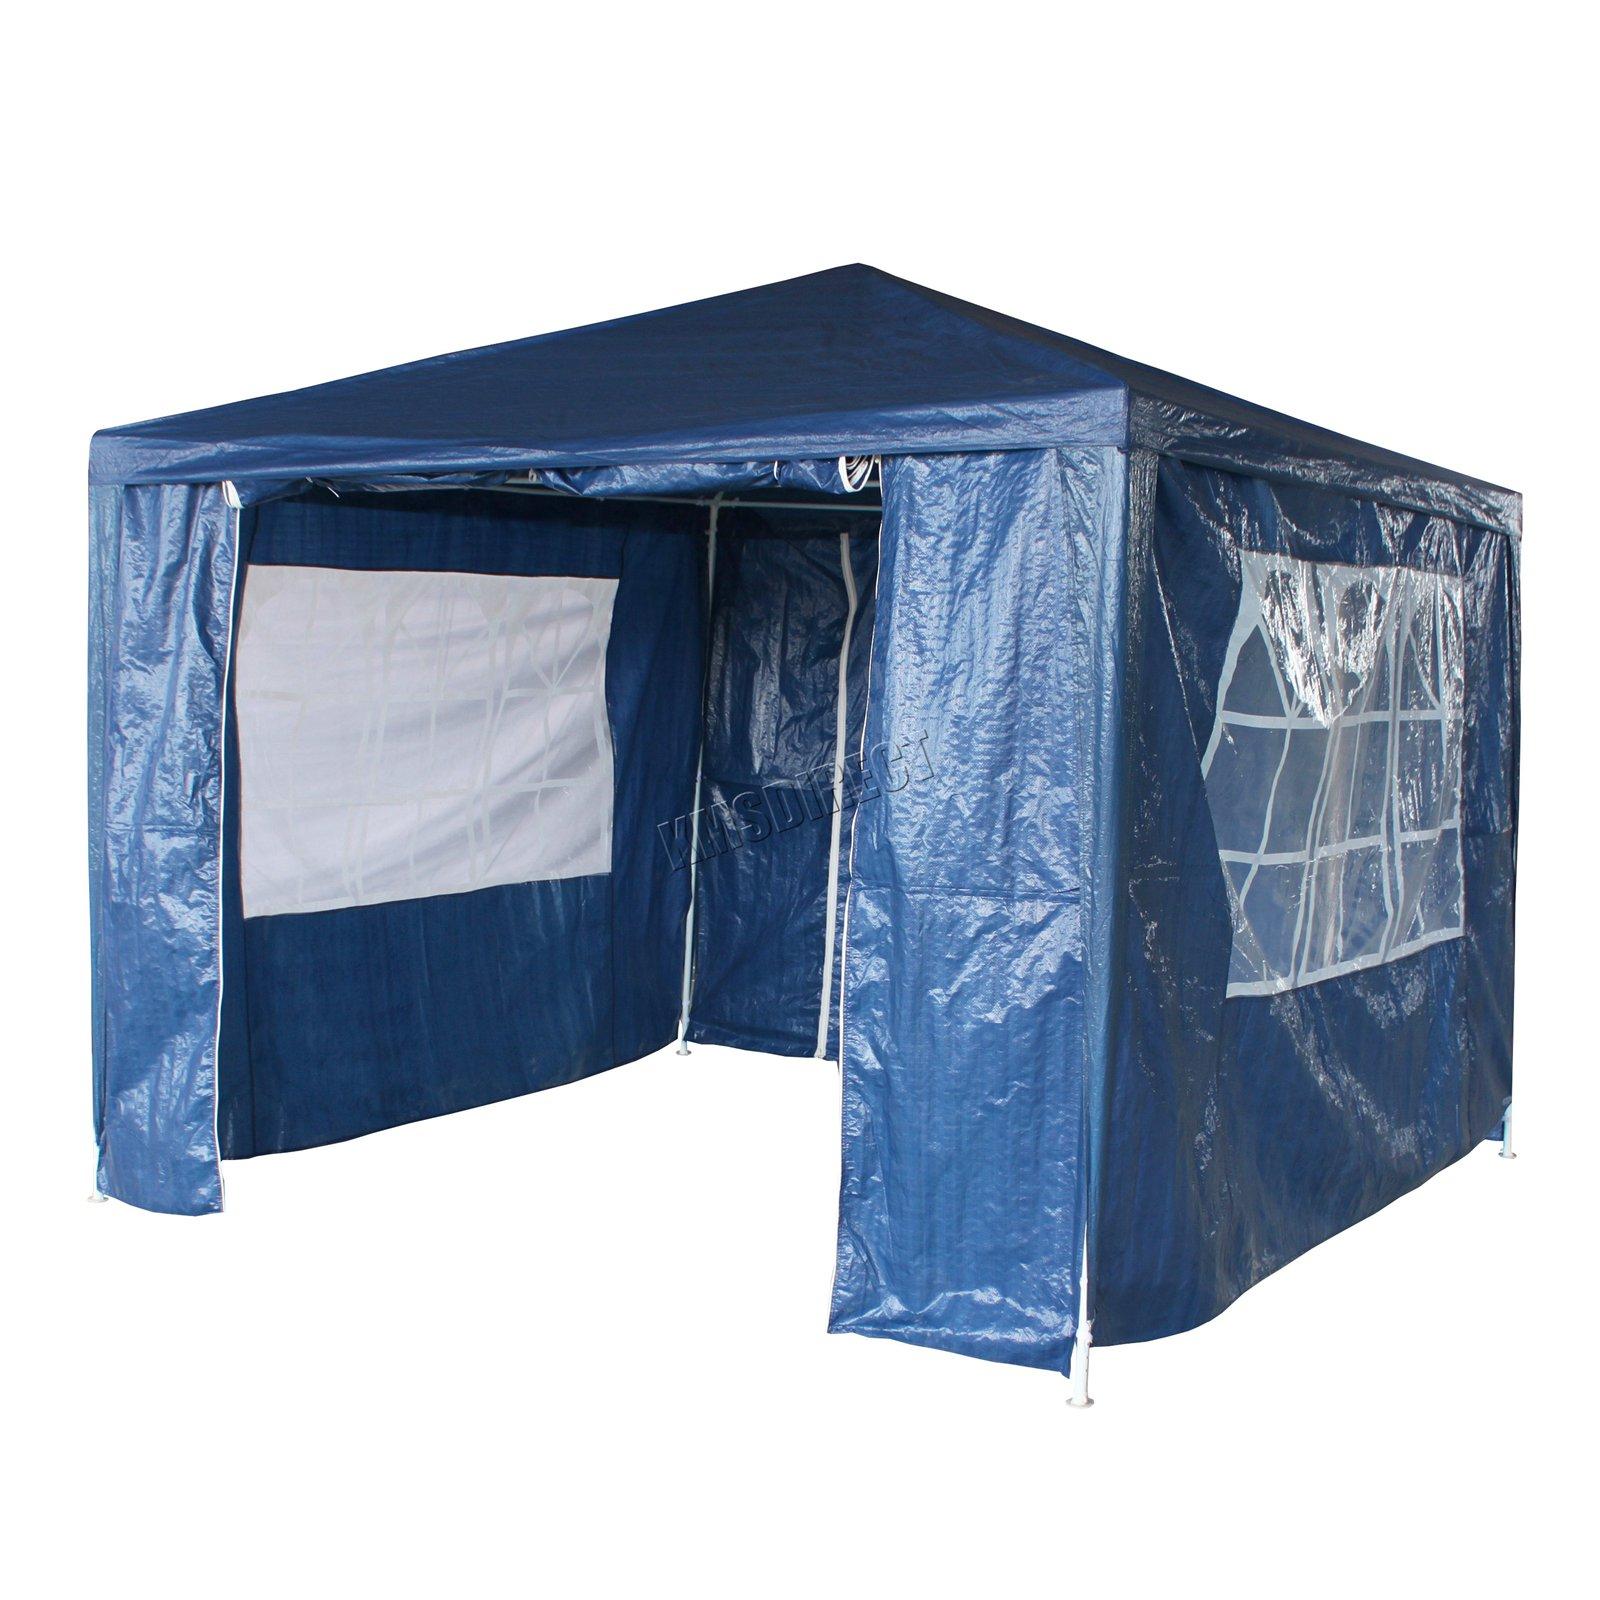 New-3-x-3m-120g-Waterproof-Outdoor-PE-Garden-Gazebo-Marquee-Canopy-Party-Tent Indexbild 15